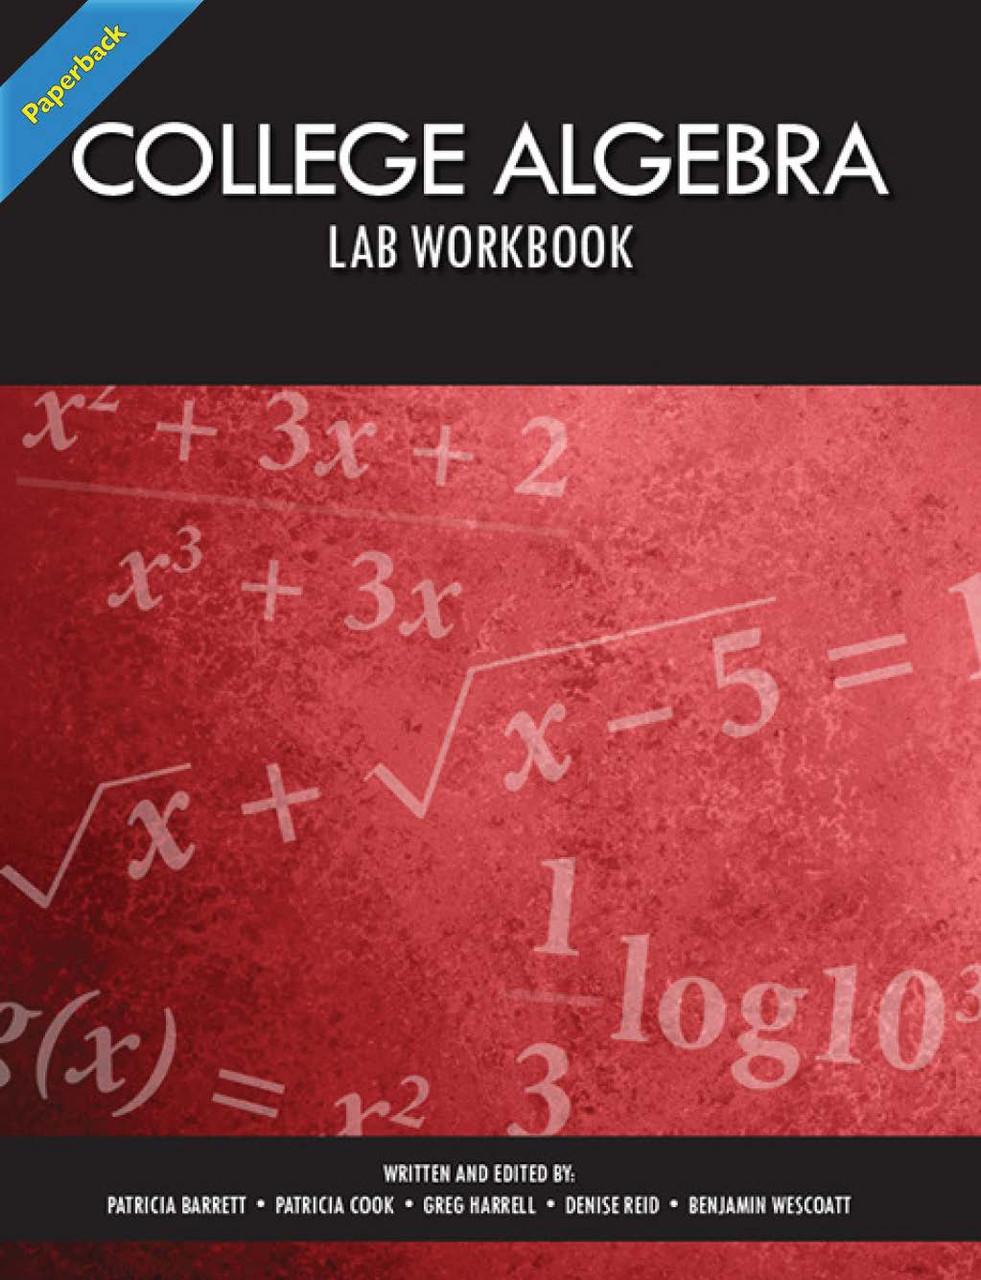 College Algebra Lab Manual (Barrett, Cook, Harrell, Reid, Wescoatt) -  Paperback